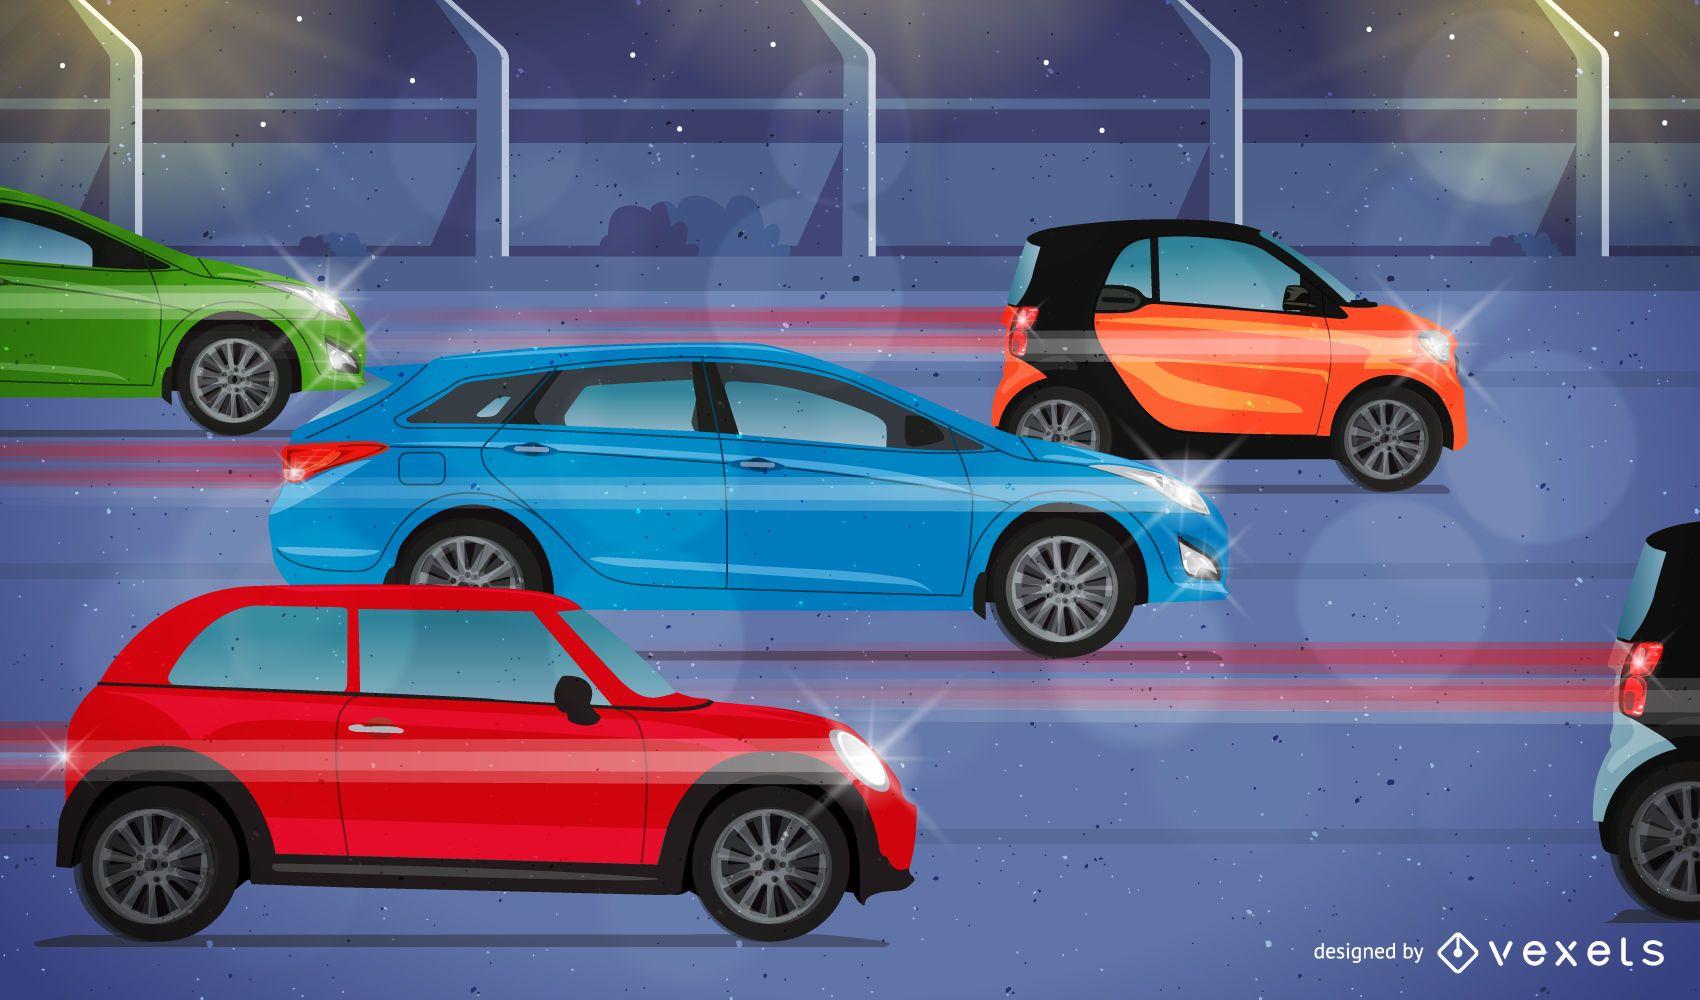 Cars on a road illustraton